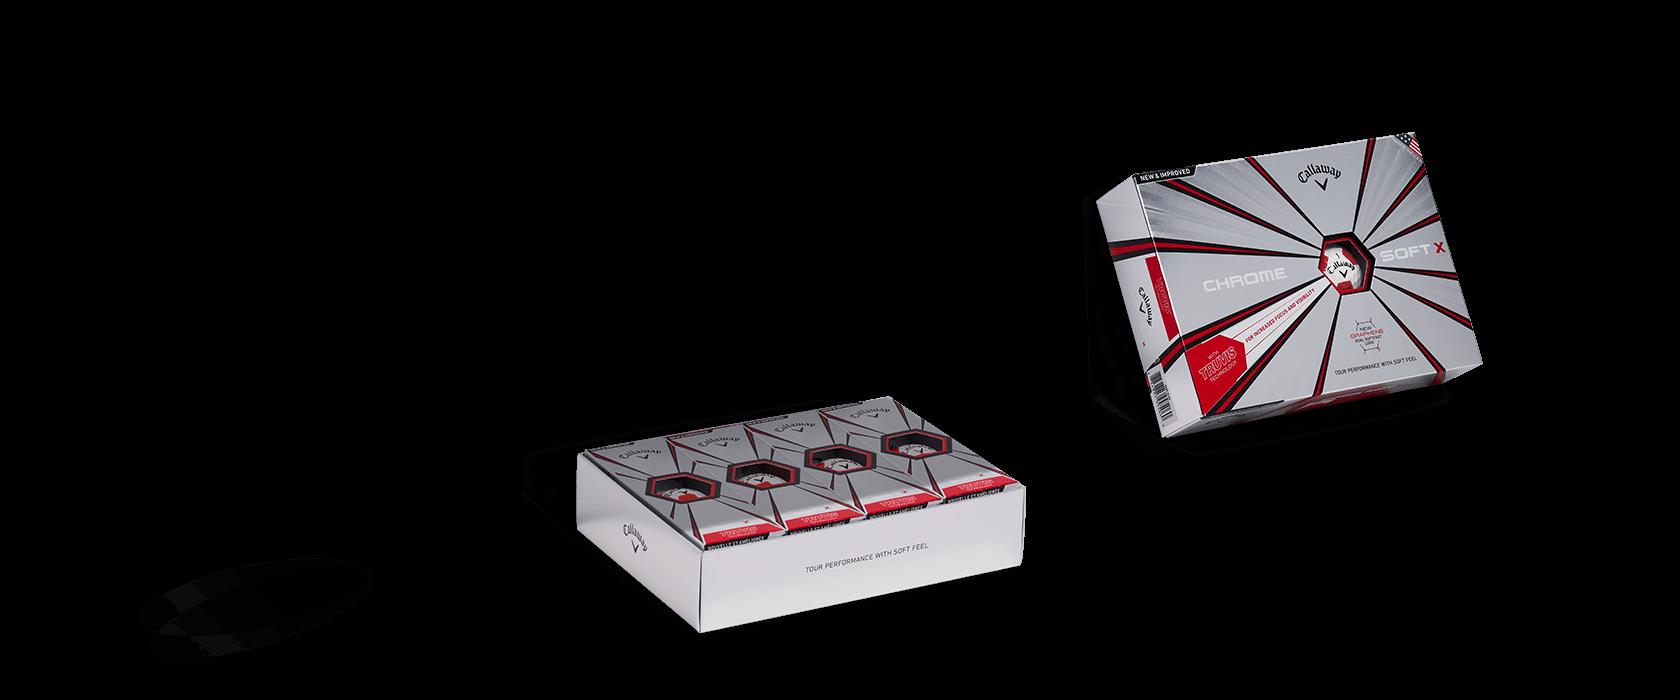 Chrome Soft Truvis Golf Ball Box